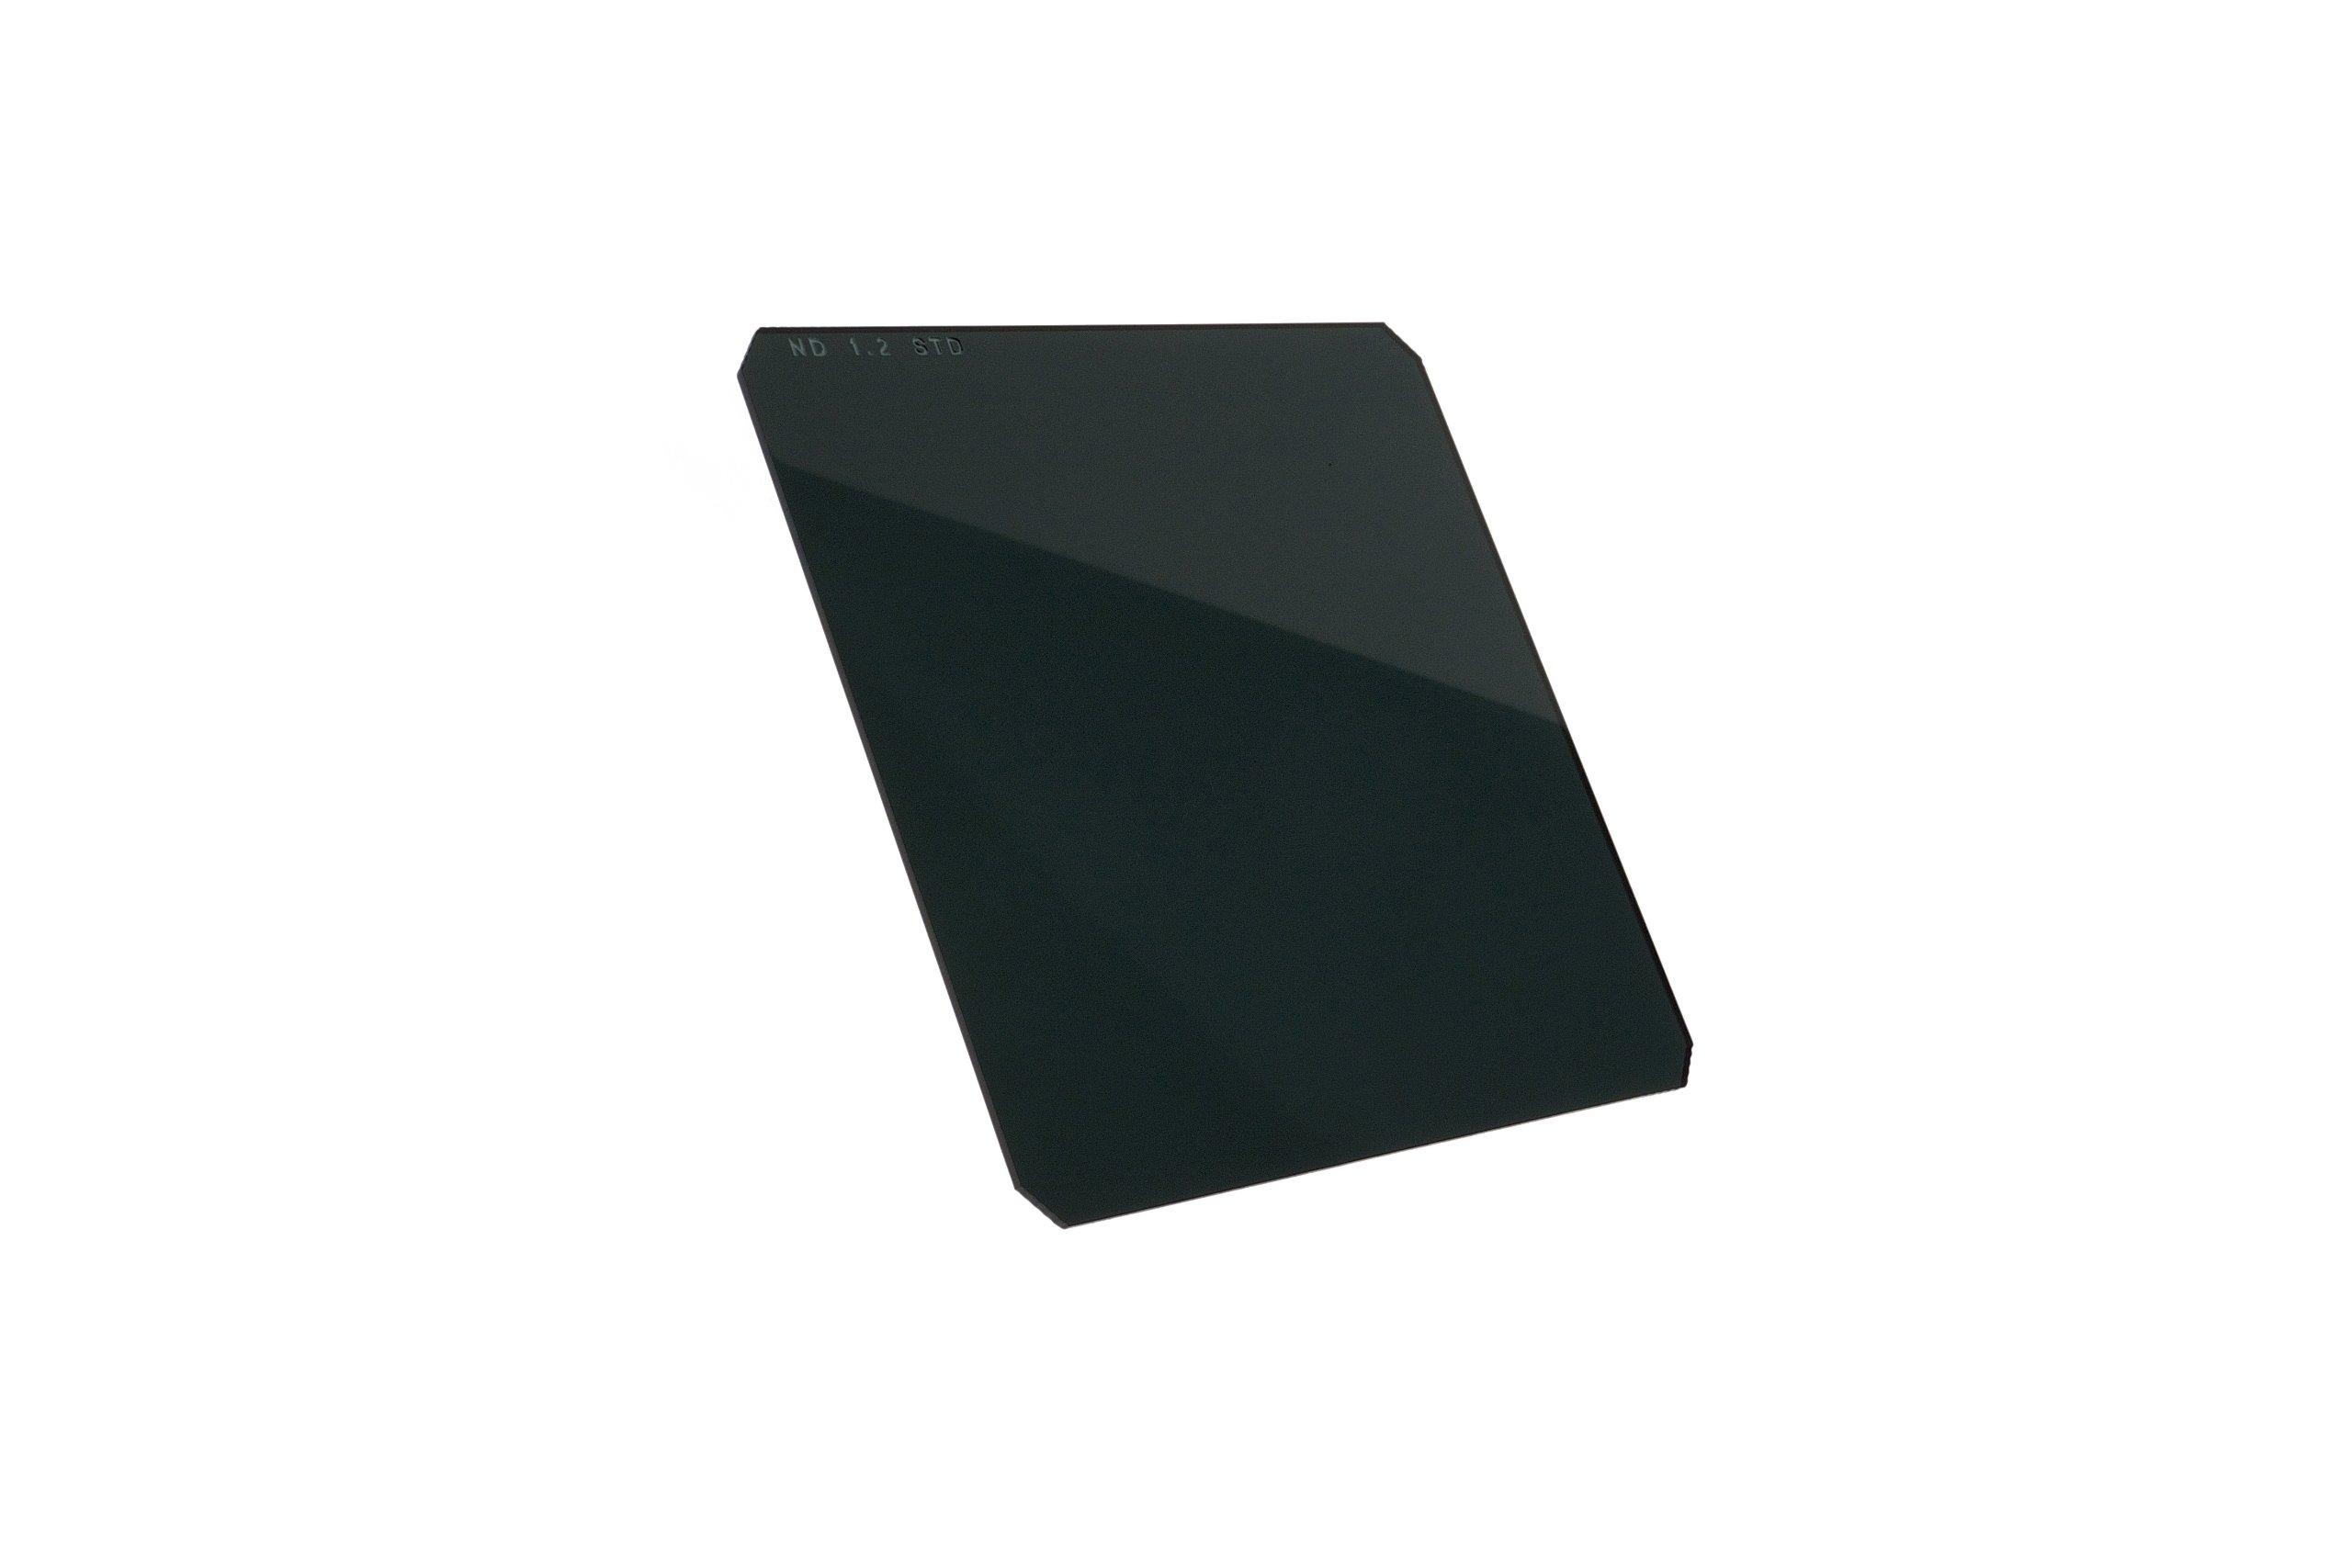 Formatt Hitech 67x85mm (2.64''x3.35'') Neutral Density 1.2 (4 stops) for Formatt Hitech 67mm modular holder, compatible with all 67mm holder systems by Formatt Hitech Limited